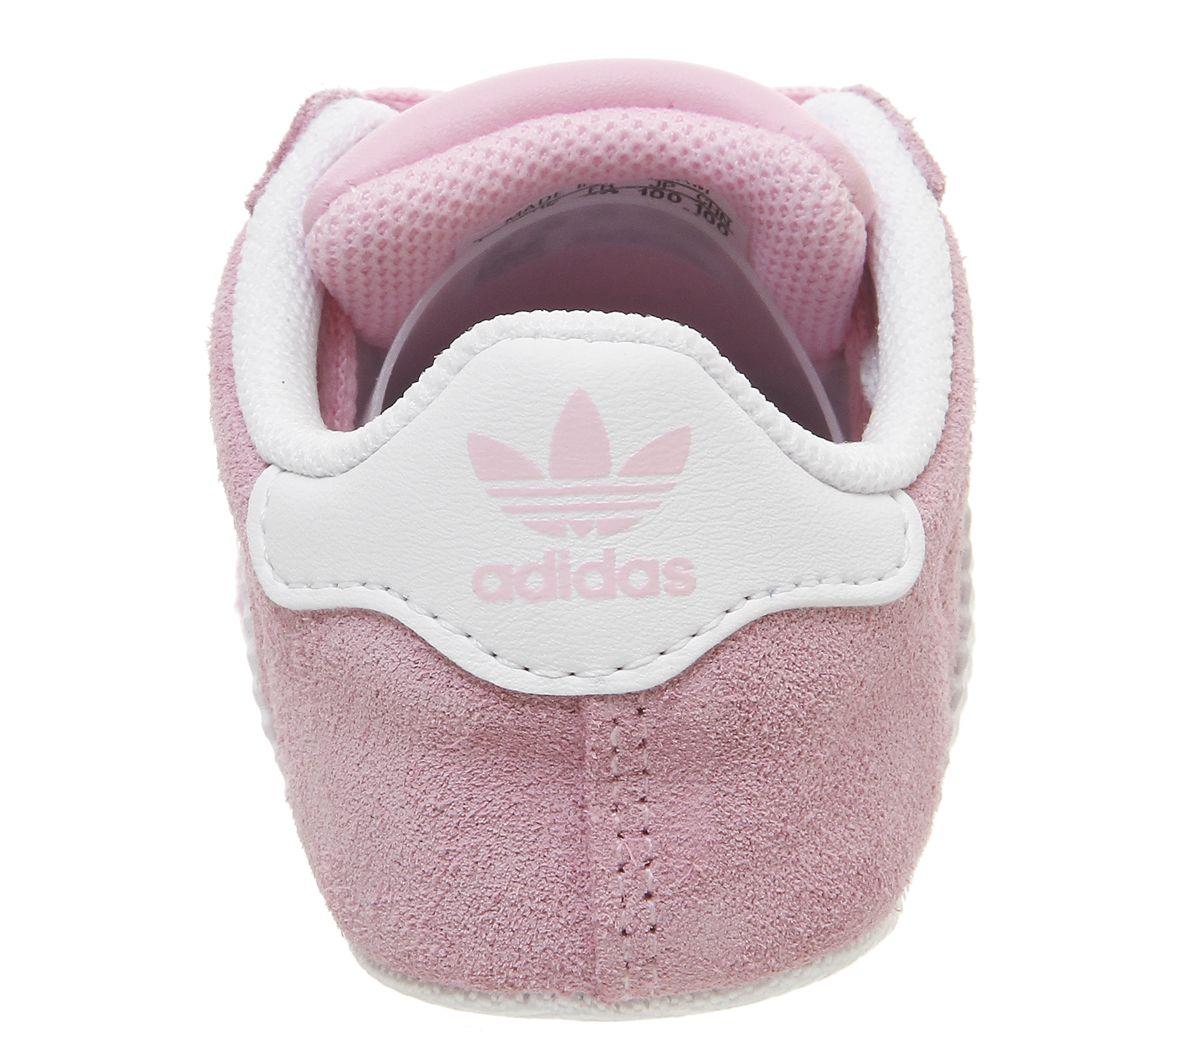 buy popular 30f85 88ddd Bambini-Adidas-Gazzella-Culla-Scarpe-Sportive-Vero-Rosa-